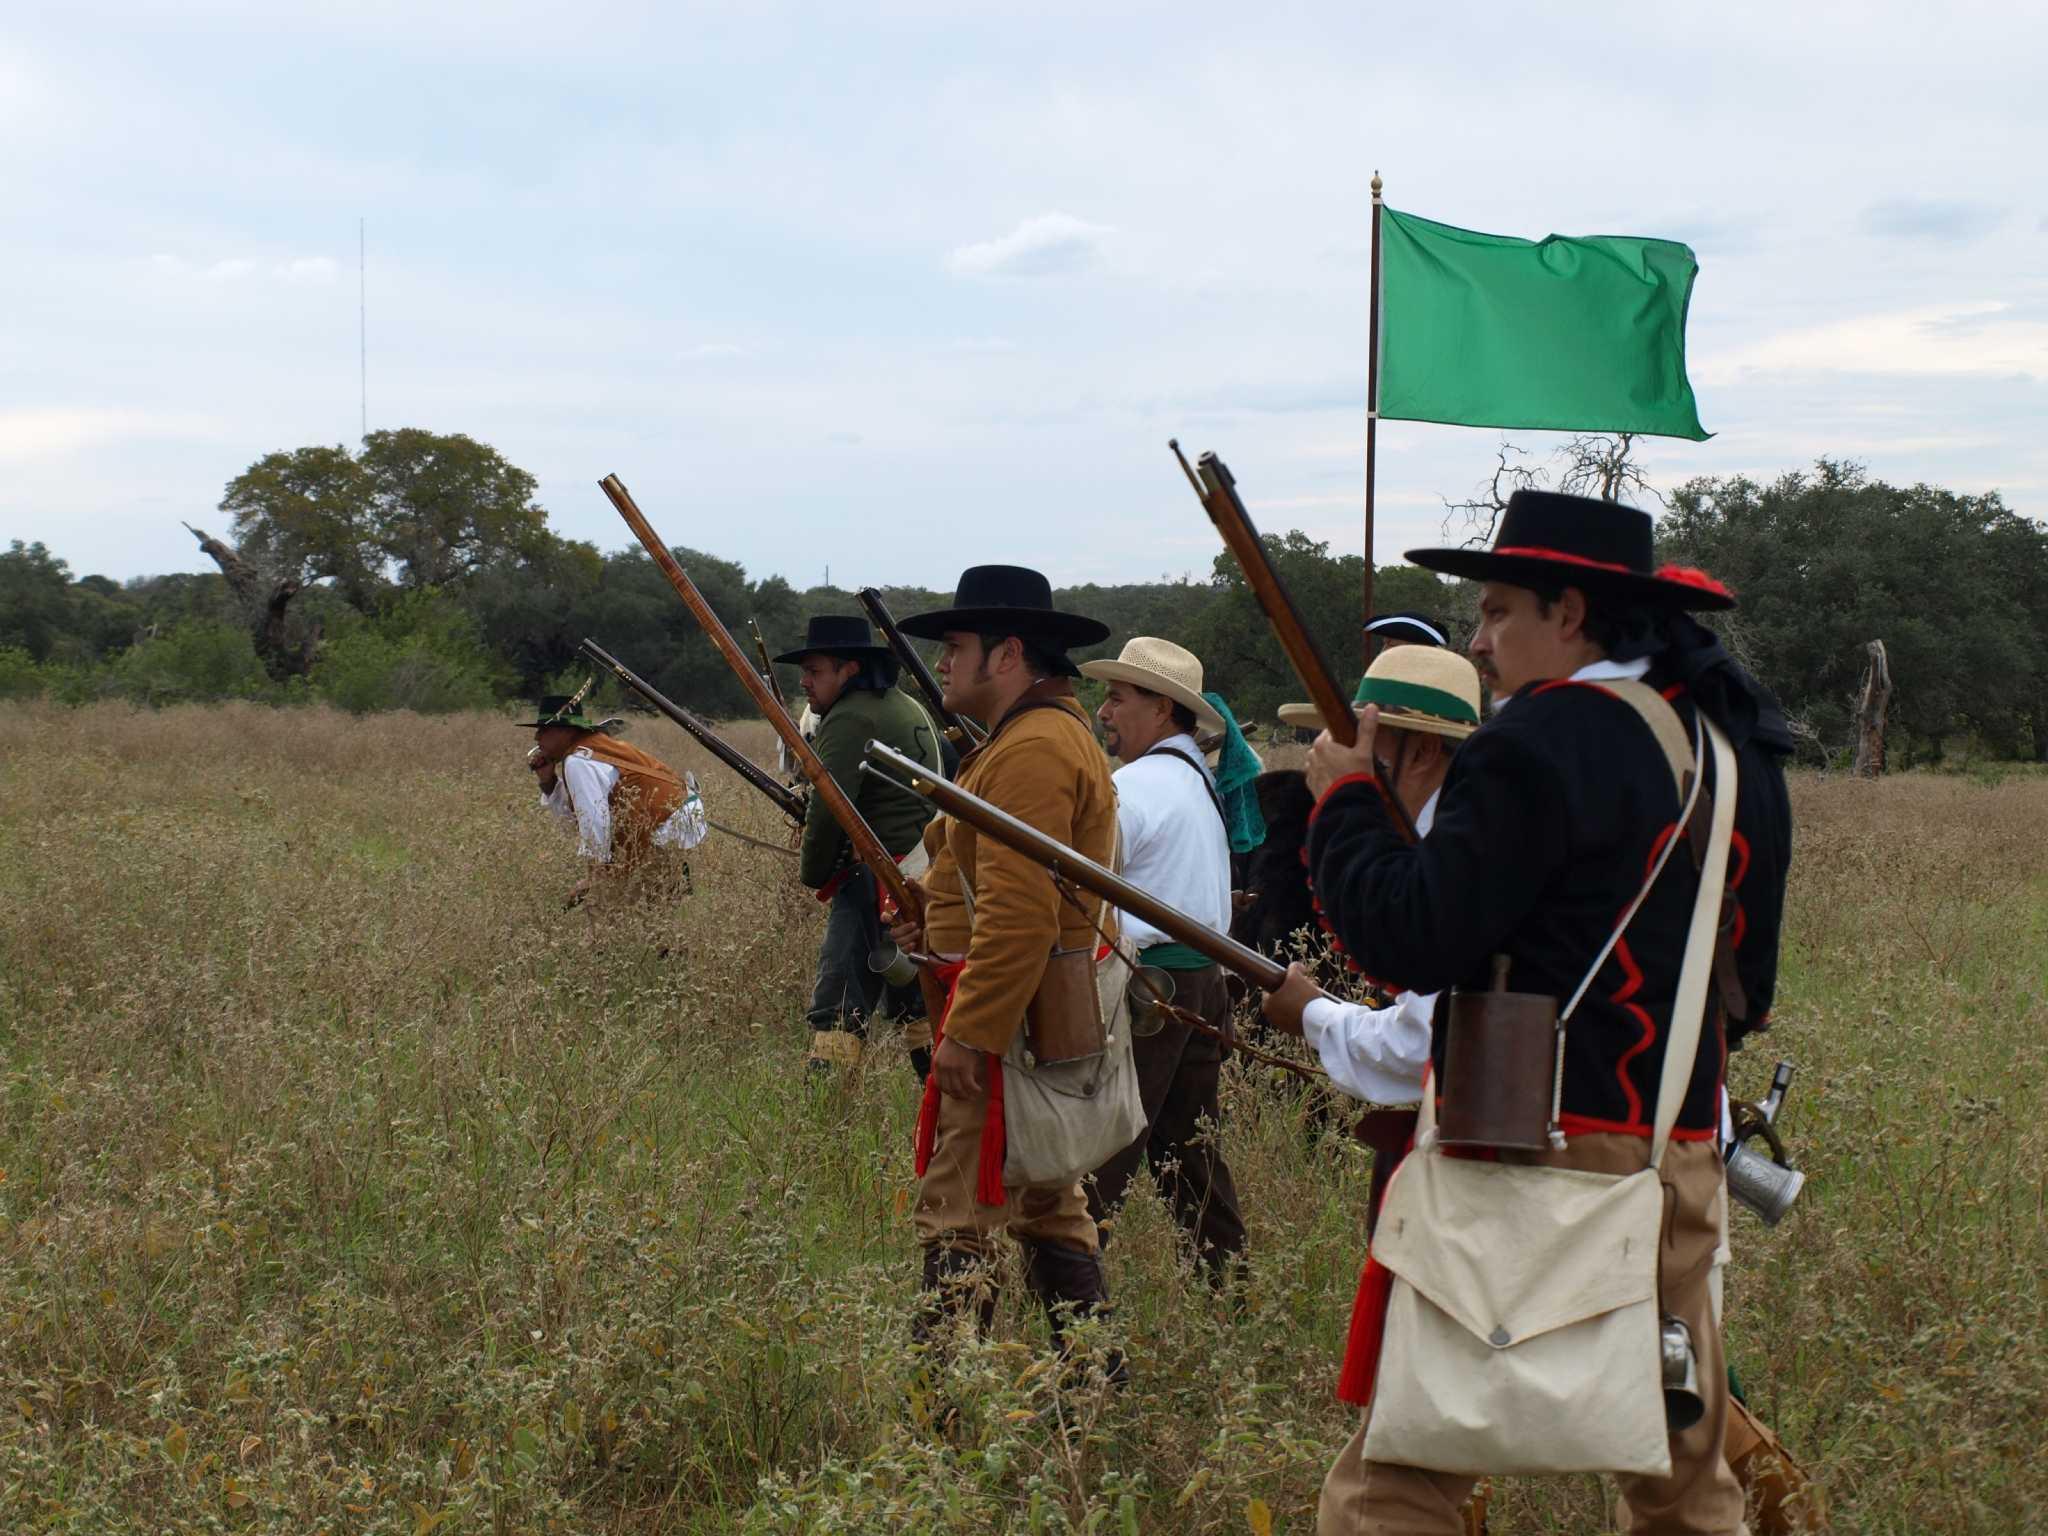 Battle of Medina mystery site gaining recognition - San Antonio Express-News